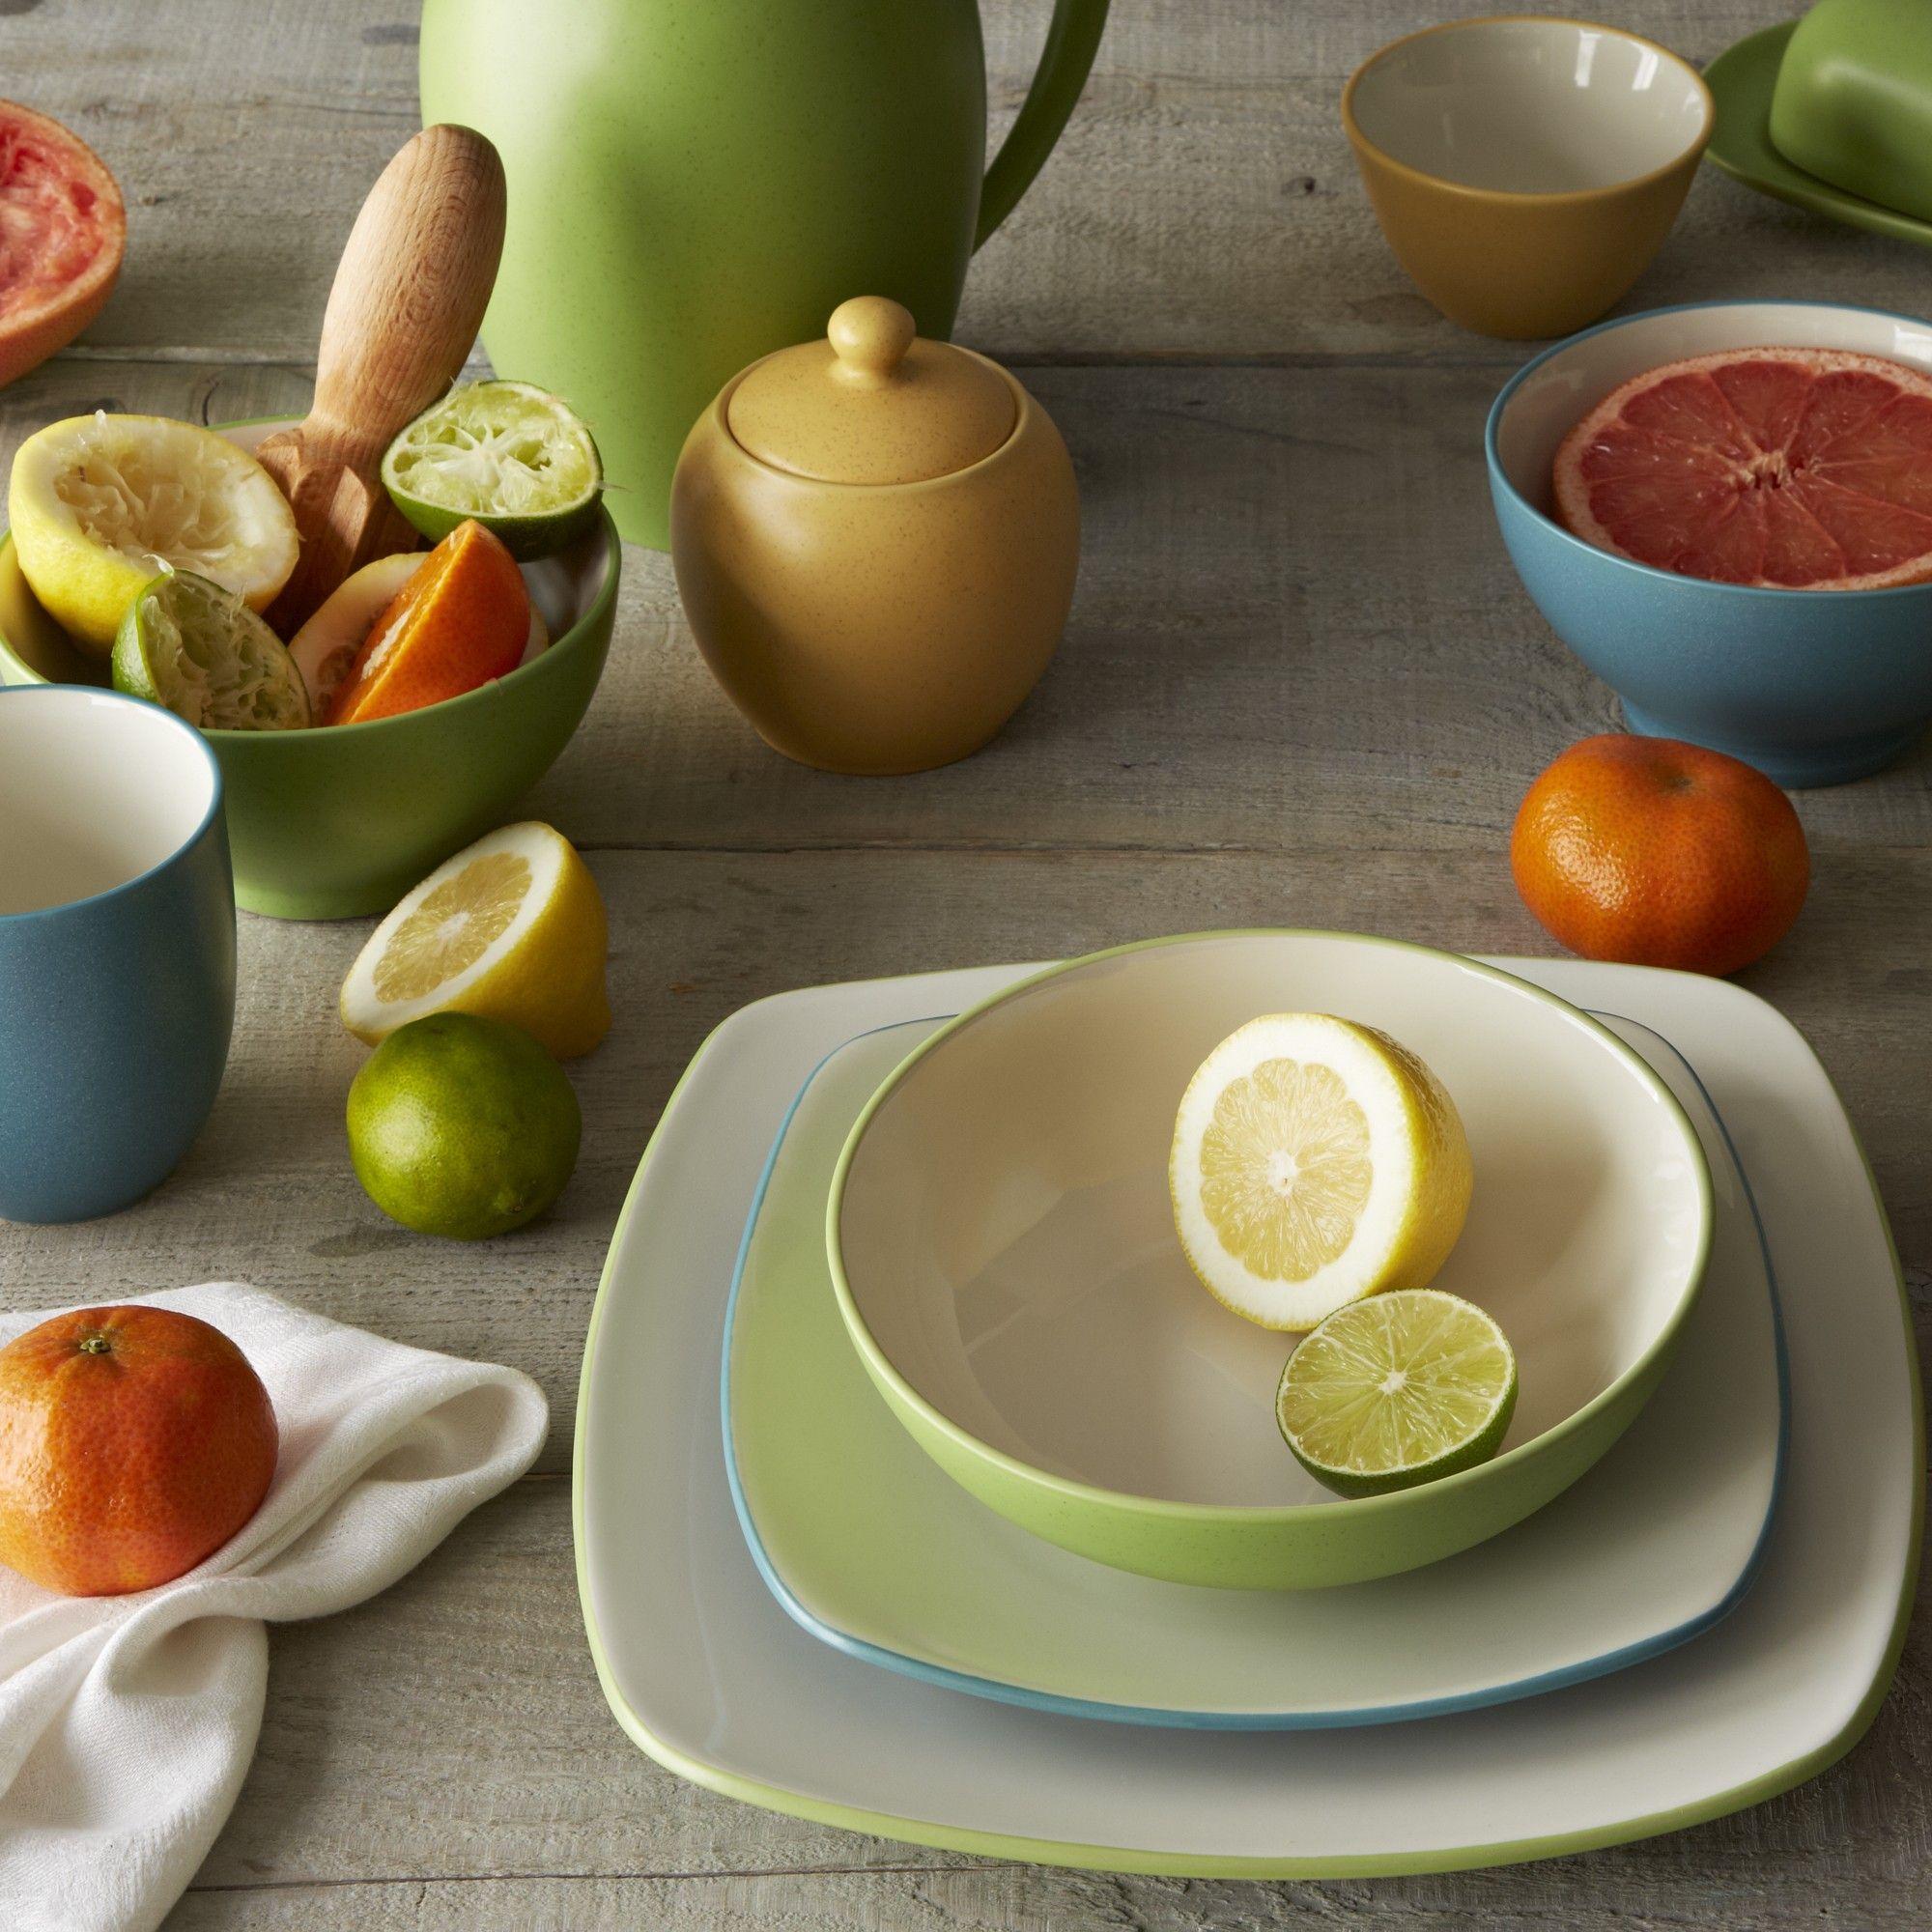 noritake colorwave apple u0026 ice - Noritake Colorwave